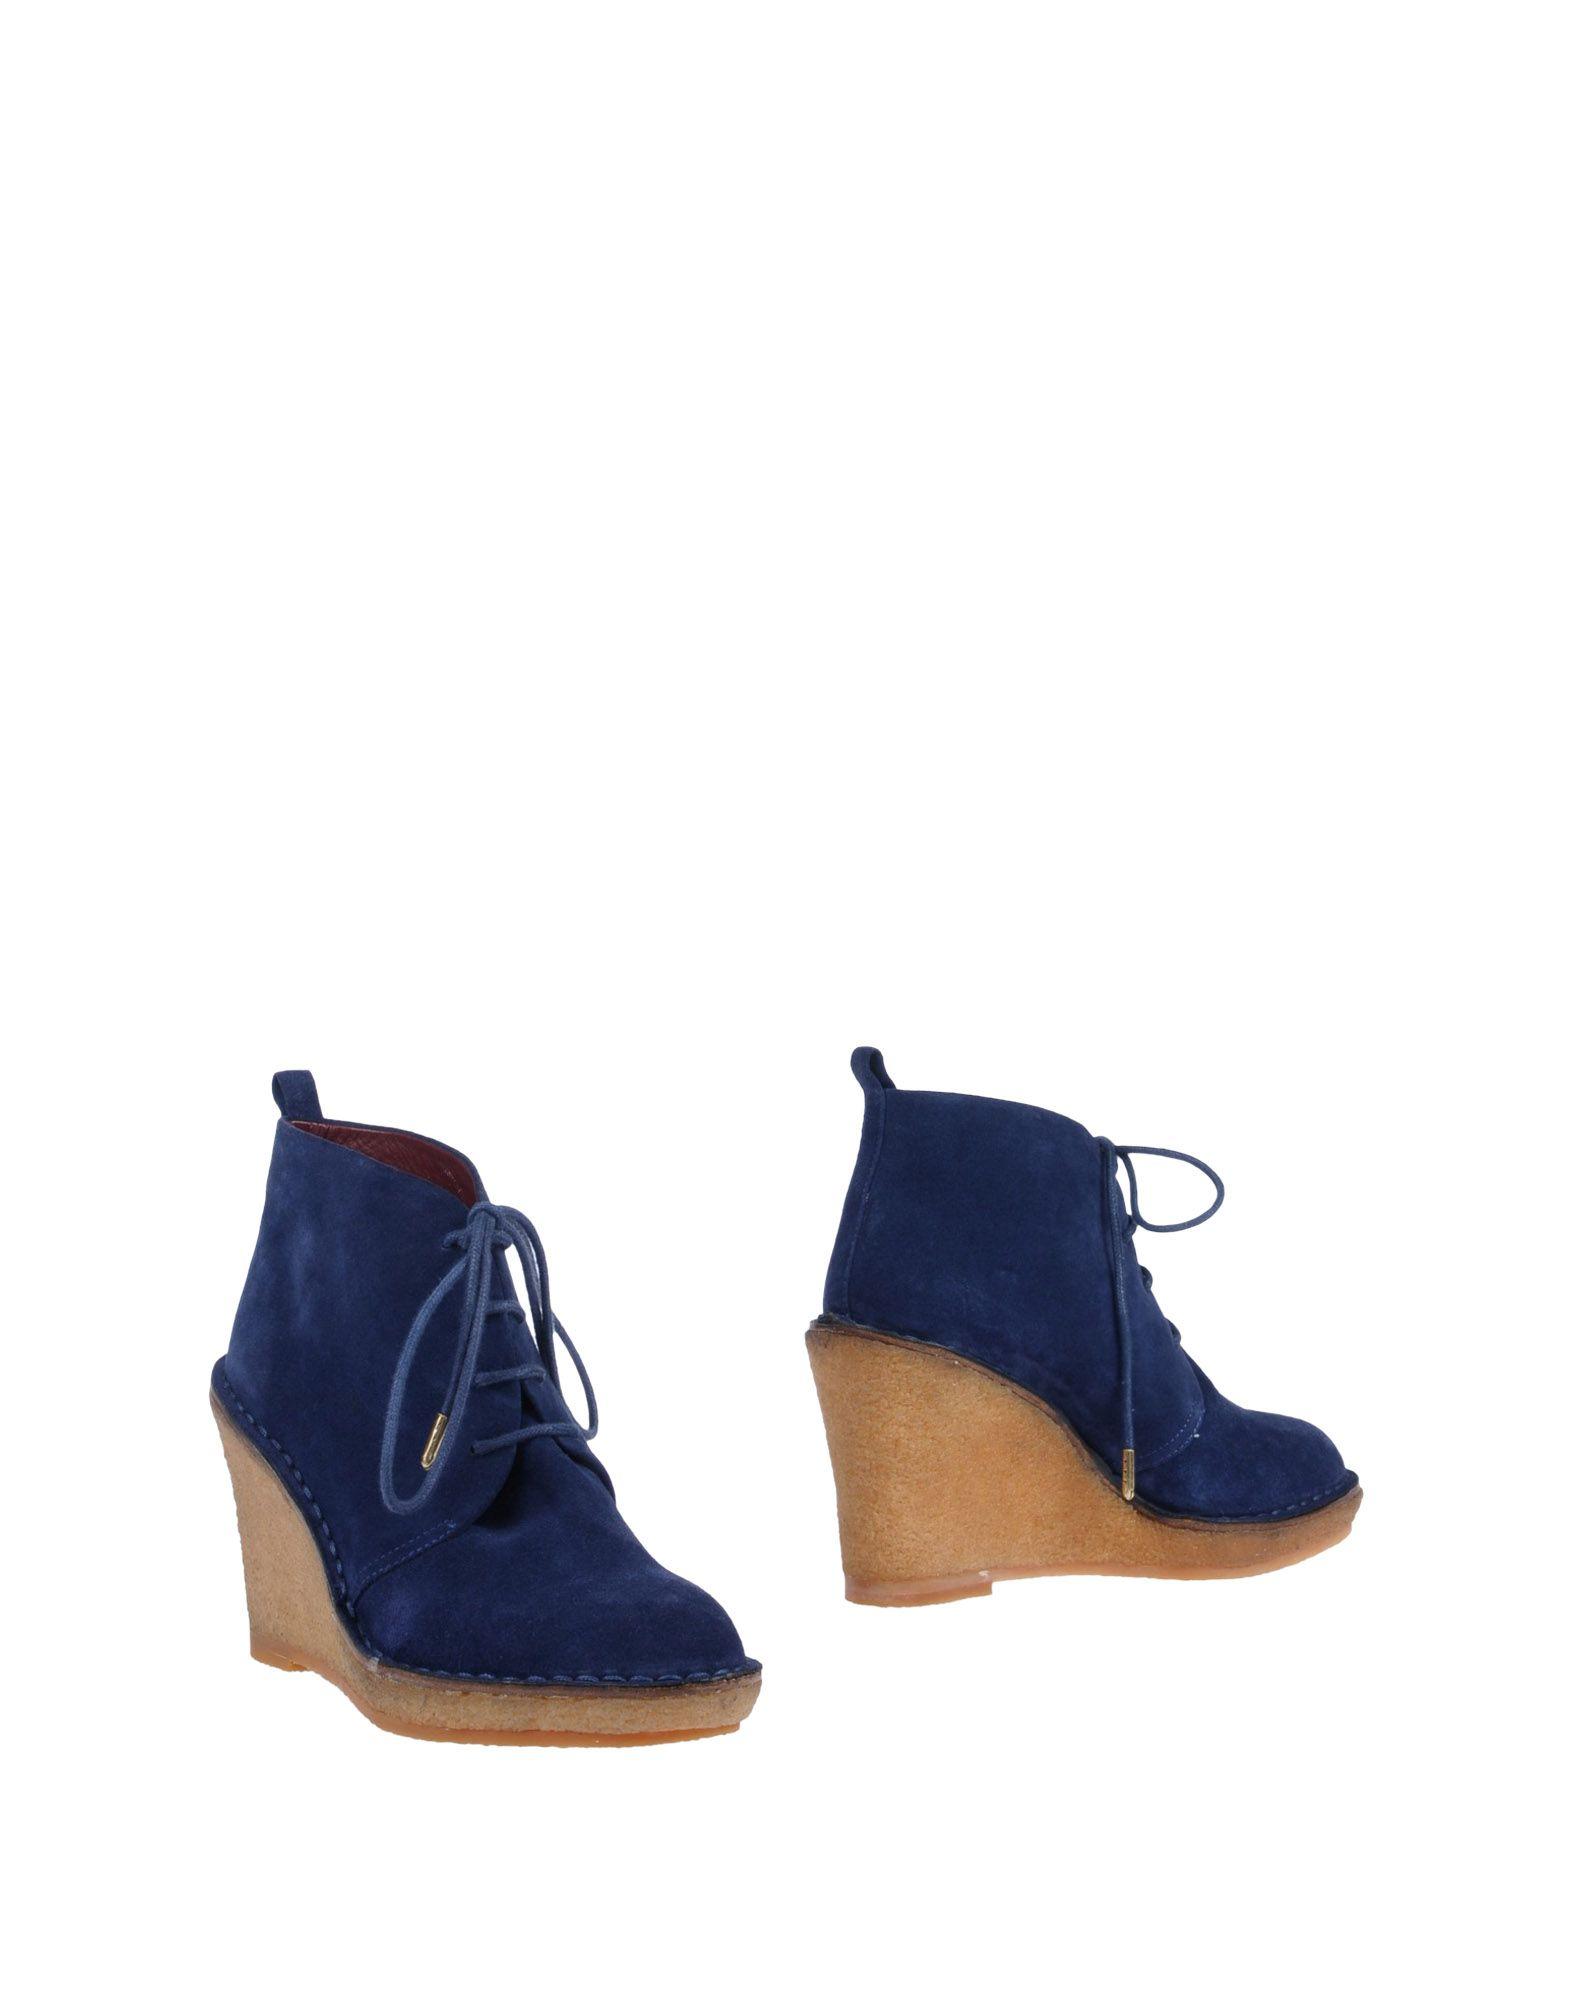 MARC BY MARC JACOBS Полусапоги и высокие ботинки si by sinela полусапоги и высокие ботинки